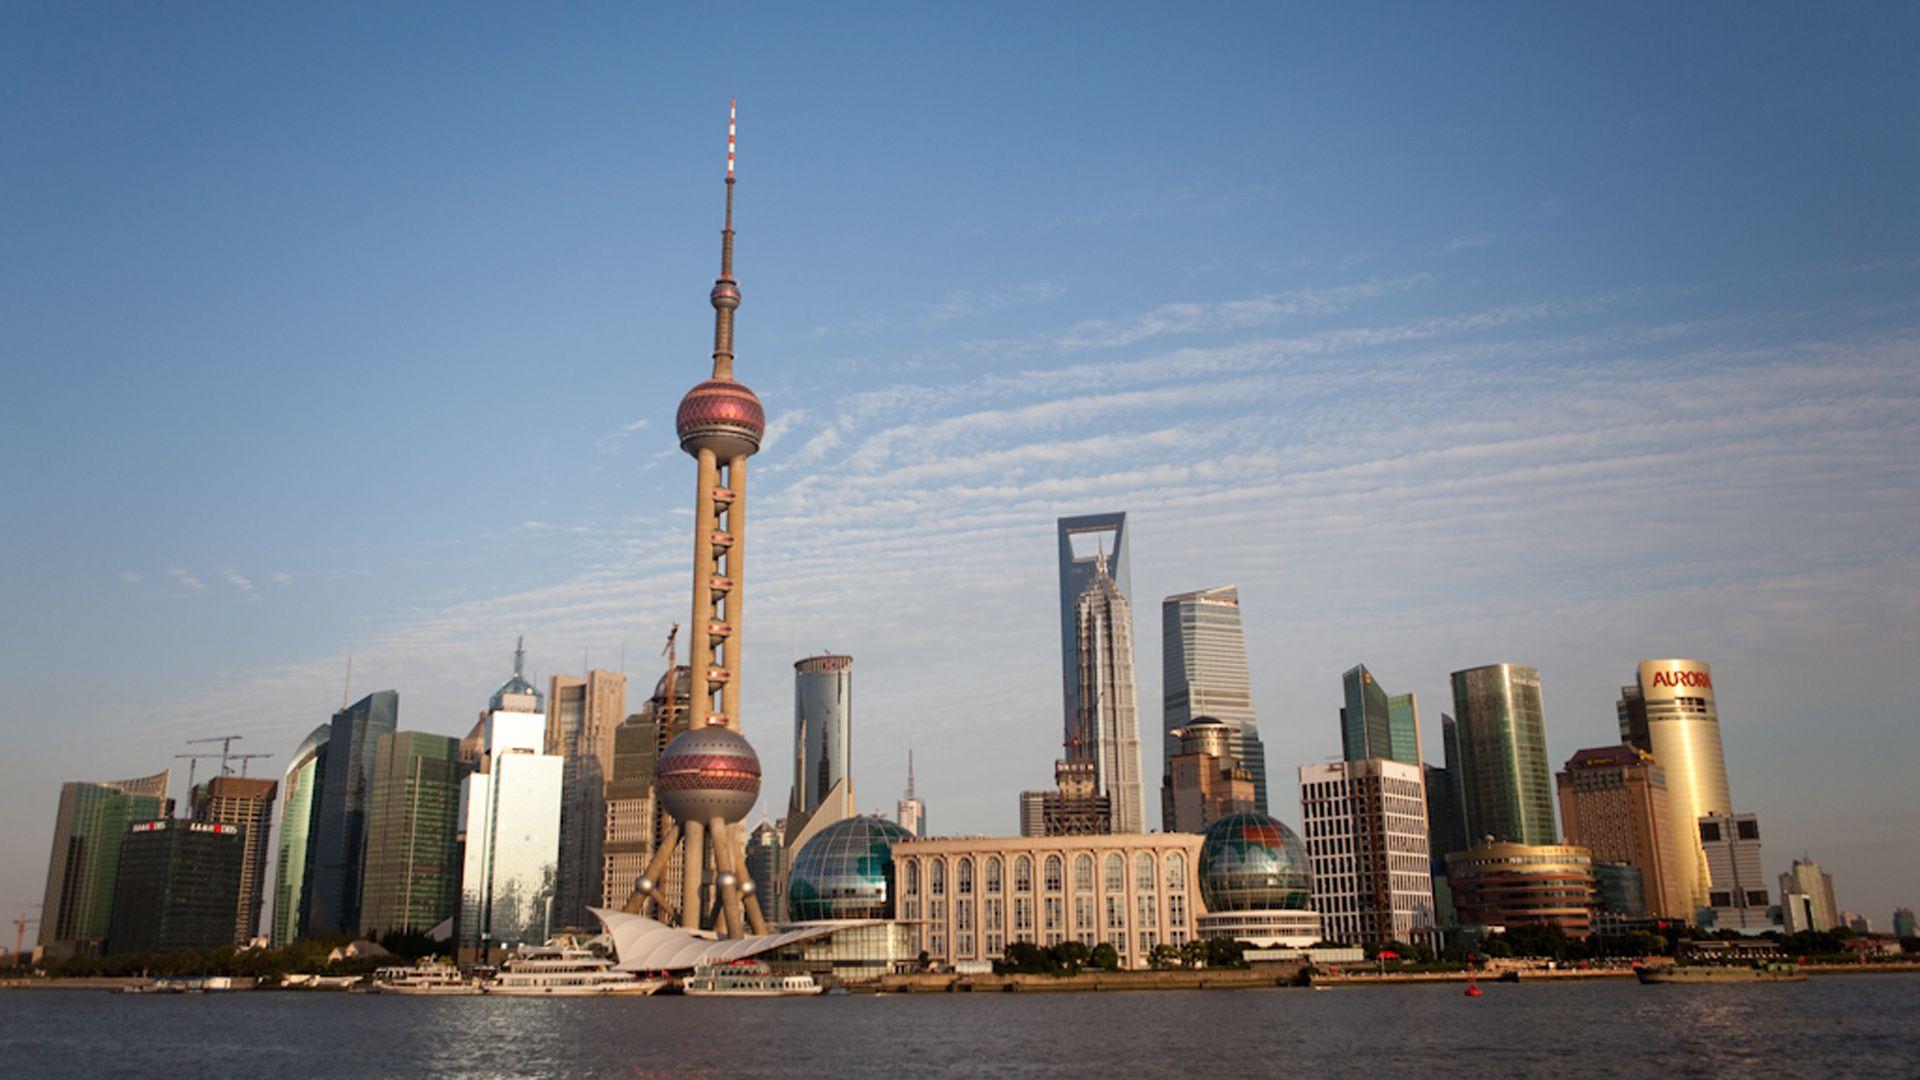 Shanghai Huangpu River Cruise上海黃浦江夜景 YouTube